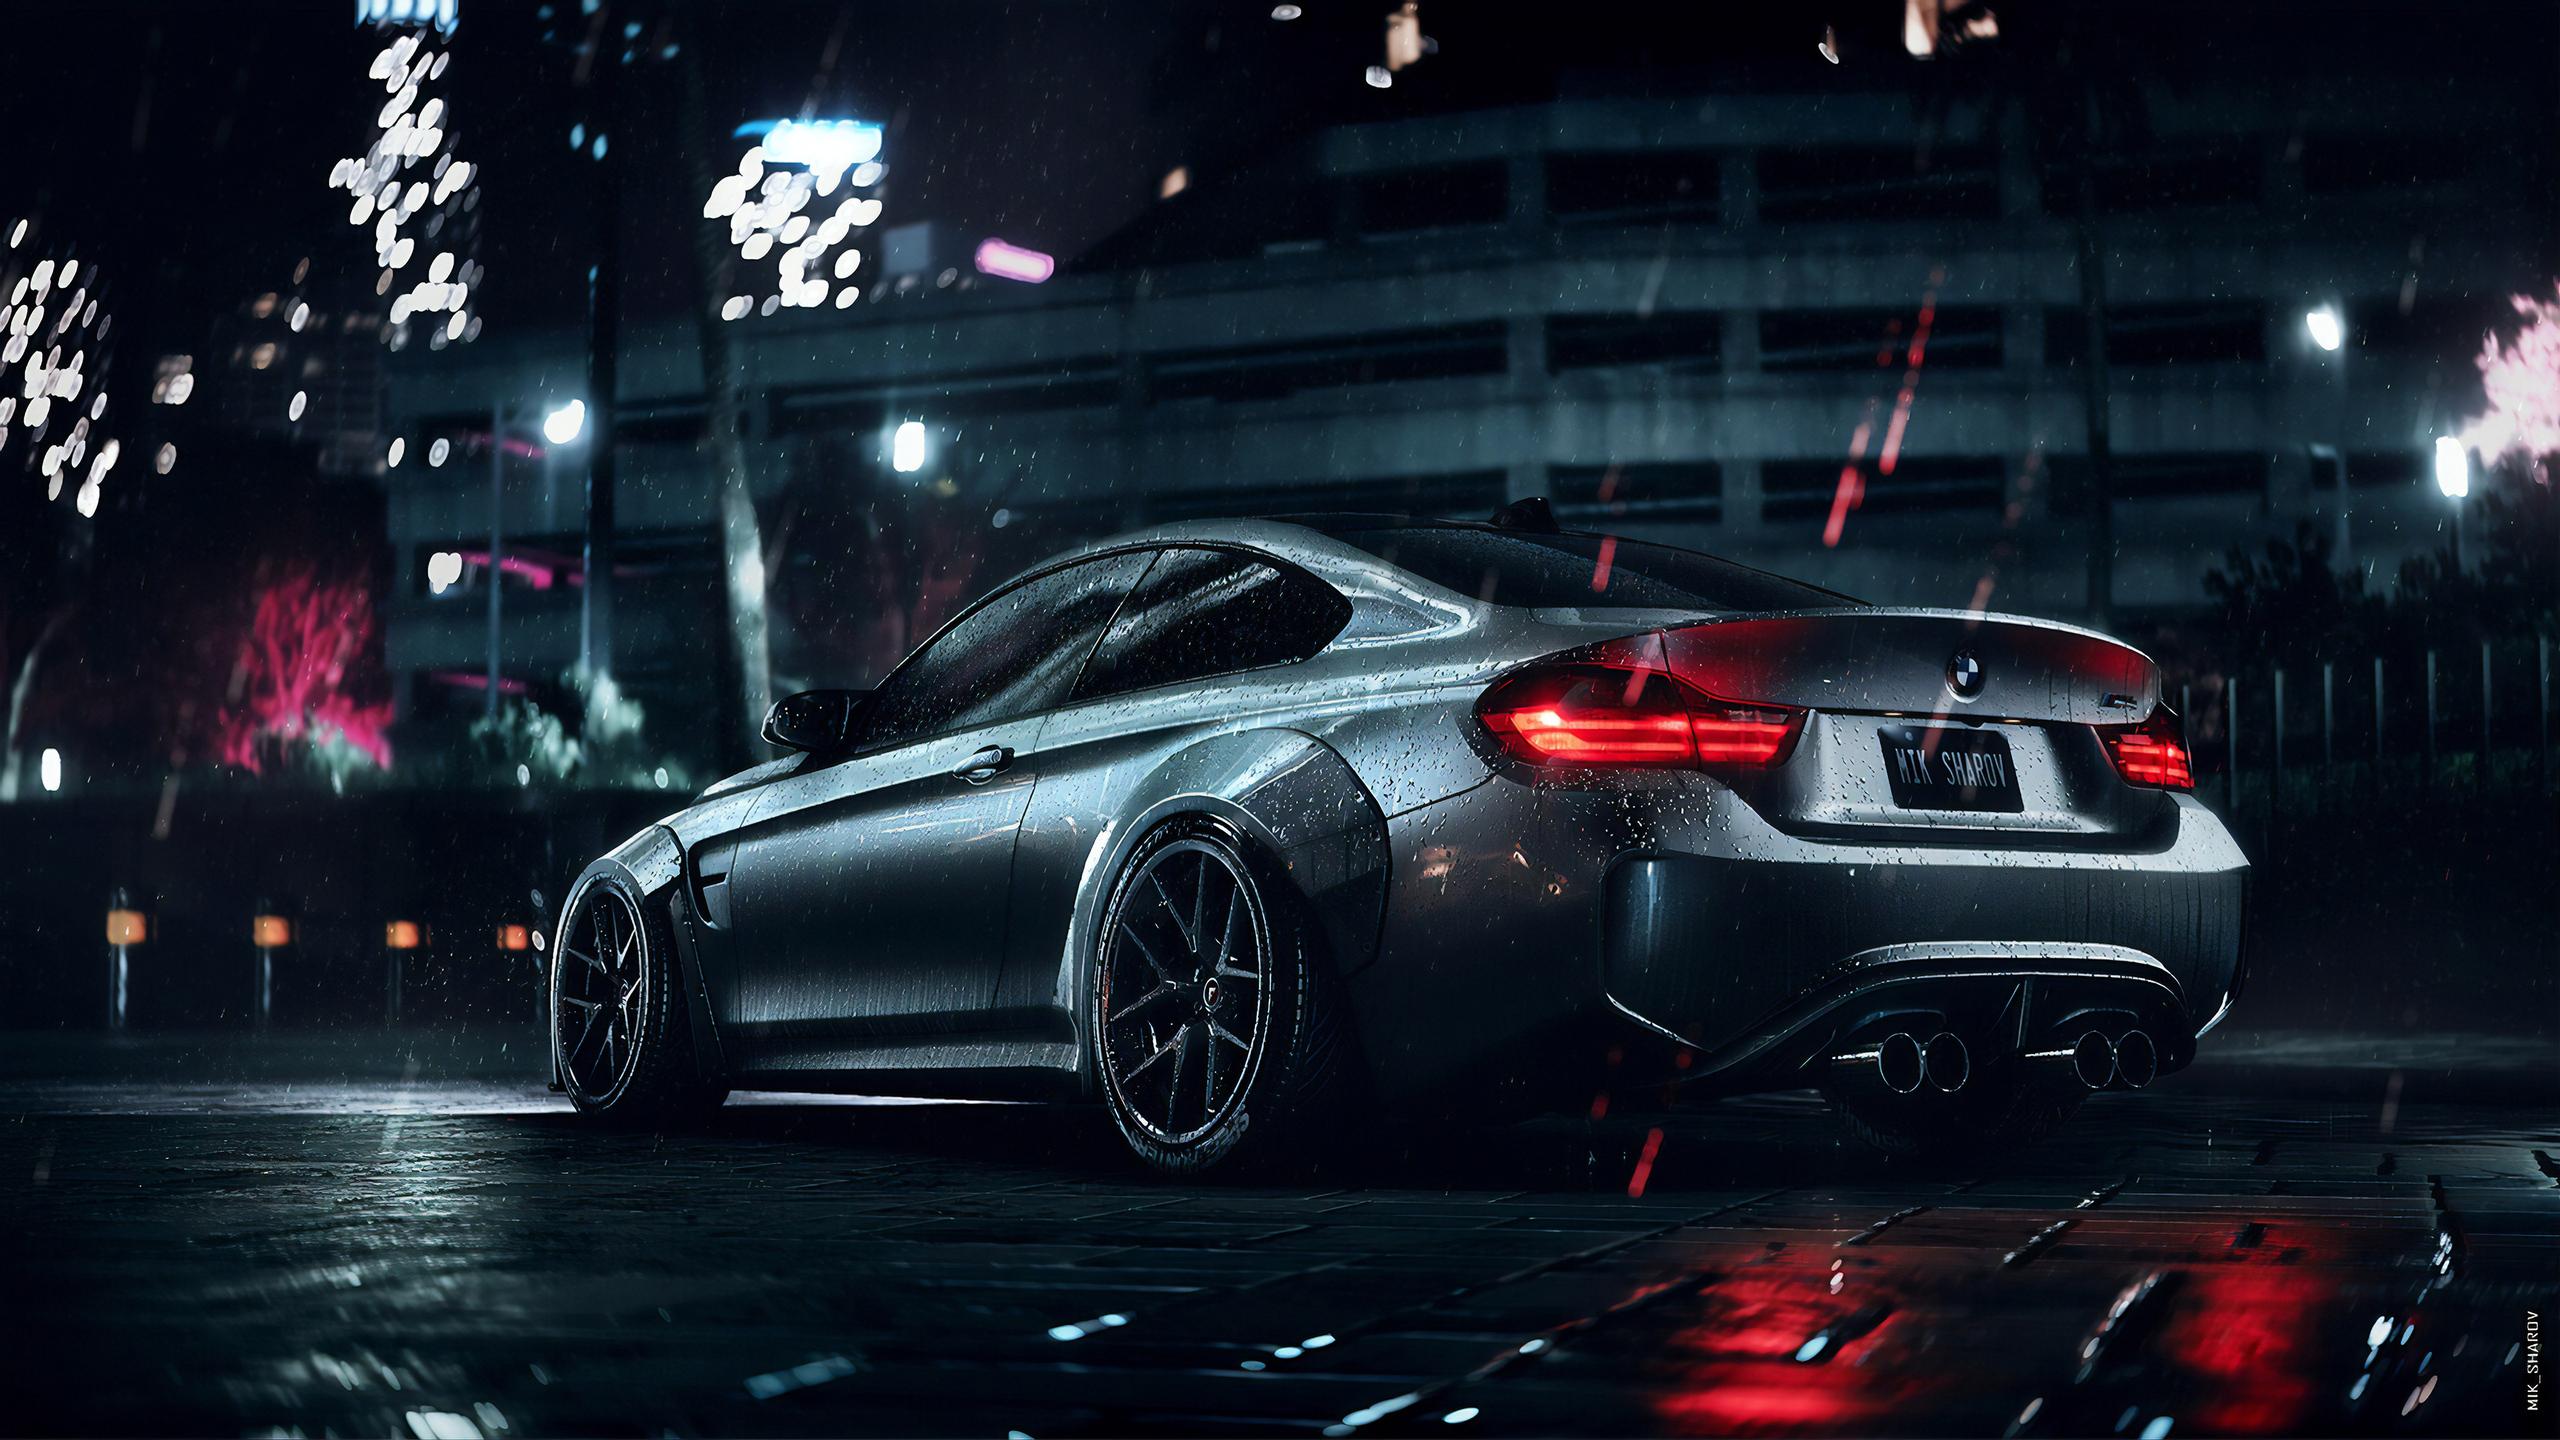 2560x1440 Need For Speed Bmw Dark Night 4k 1440P ...